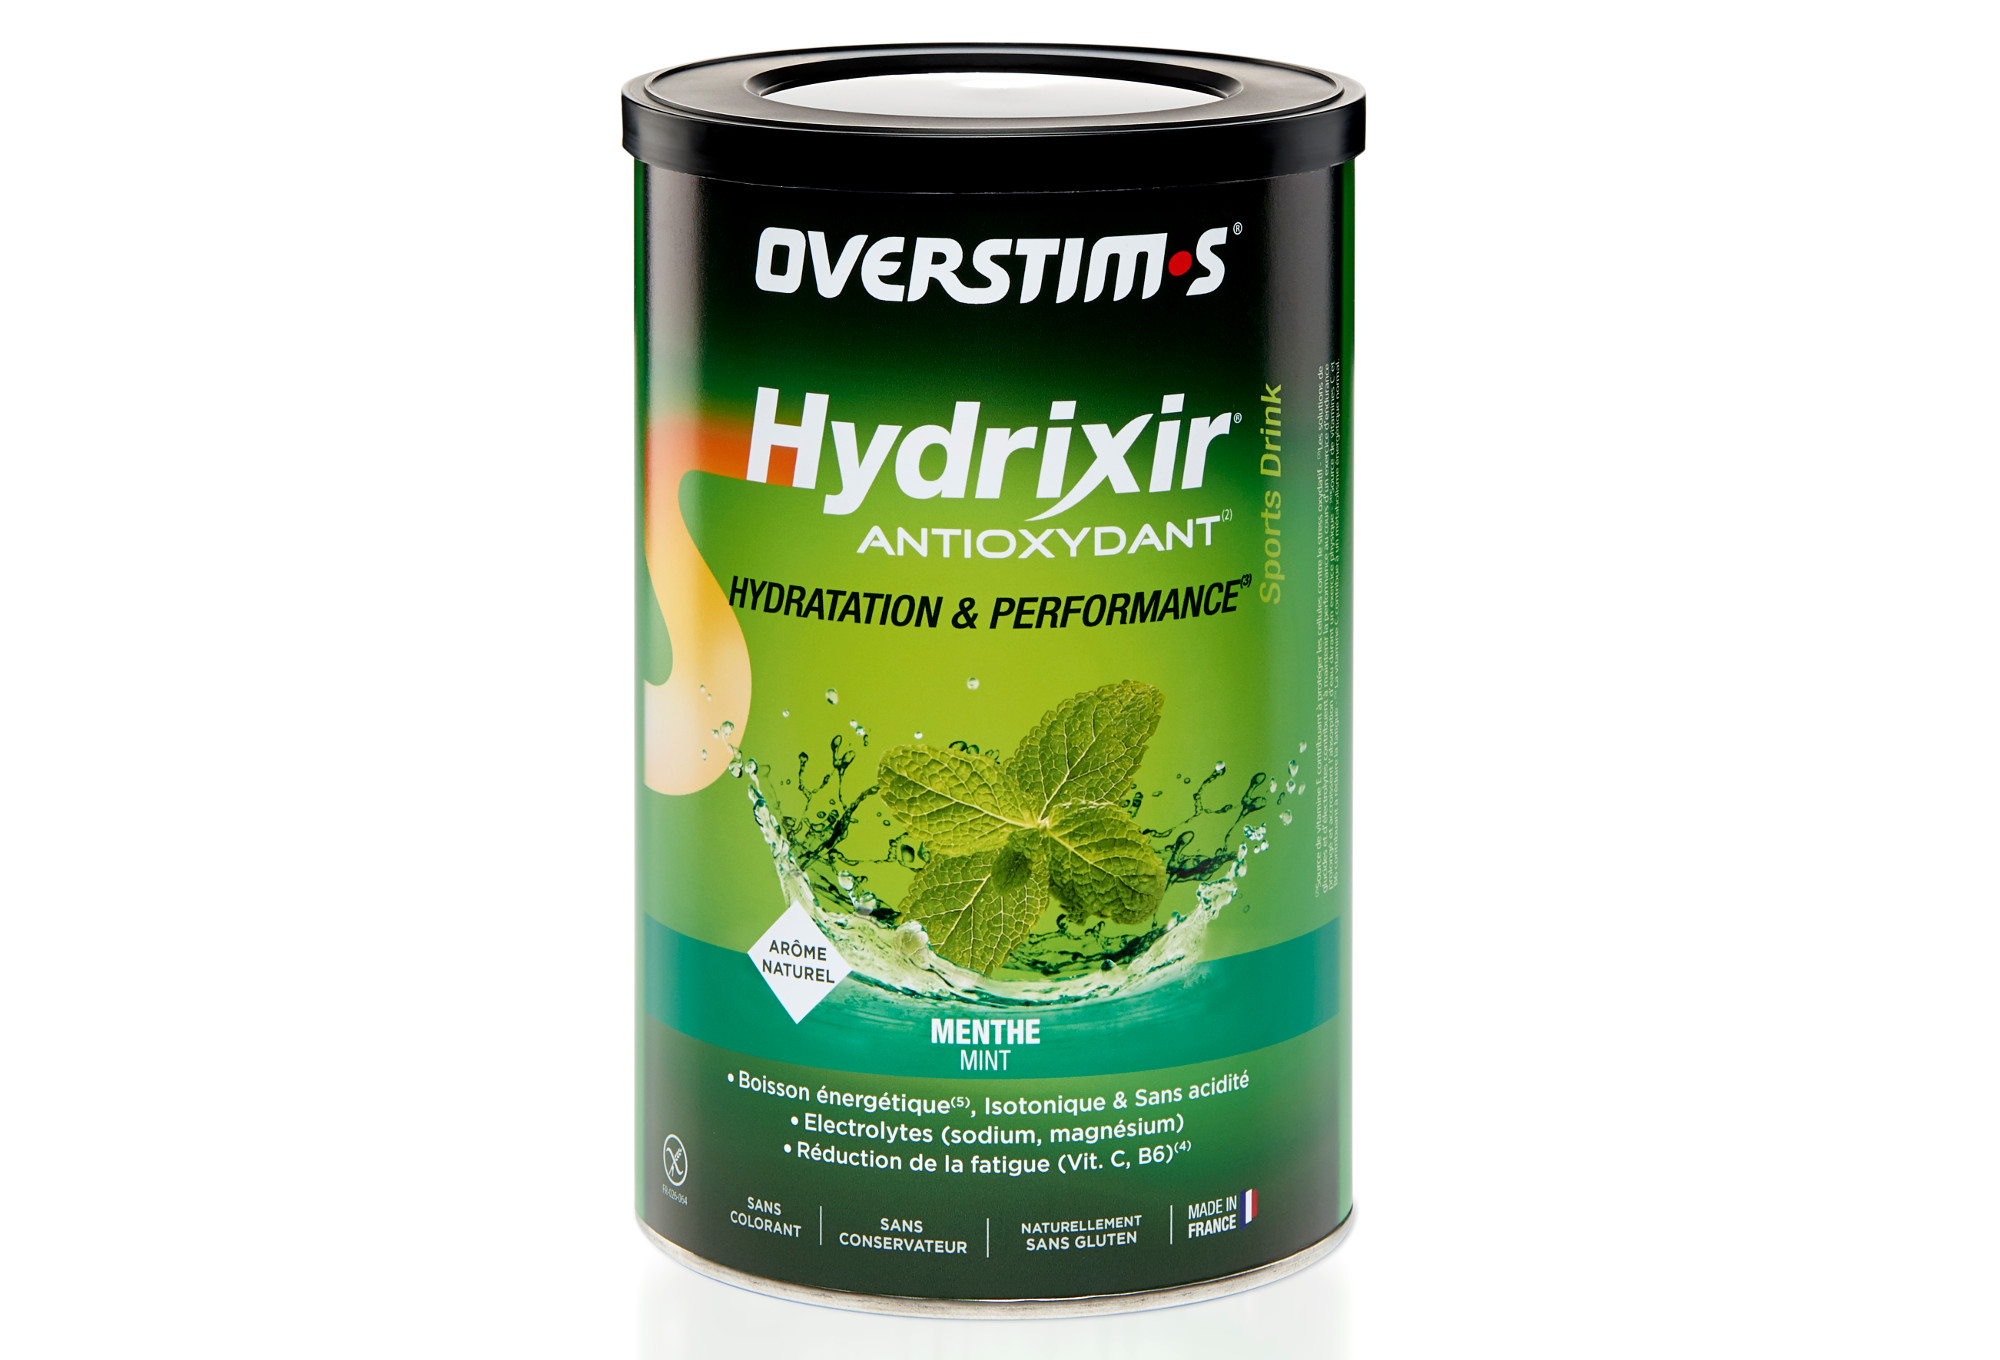 OVERSTIMS Energy Drink ANTIOXYDANT HYDRIXIR Mint 600g